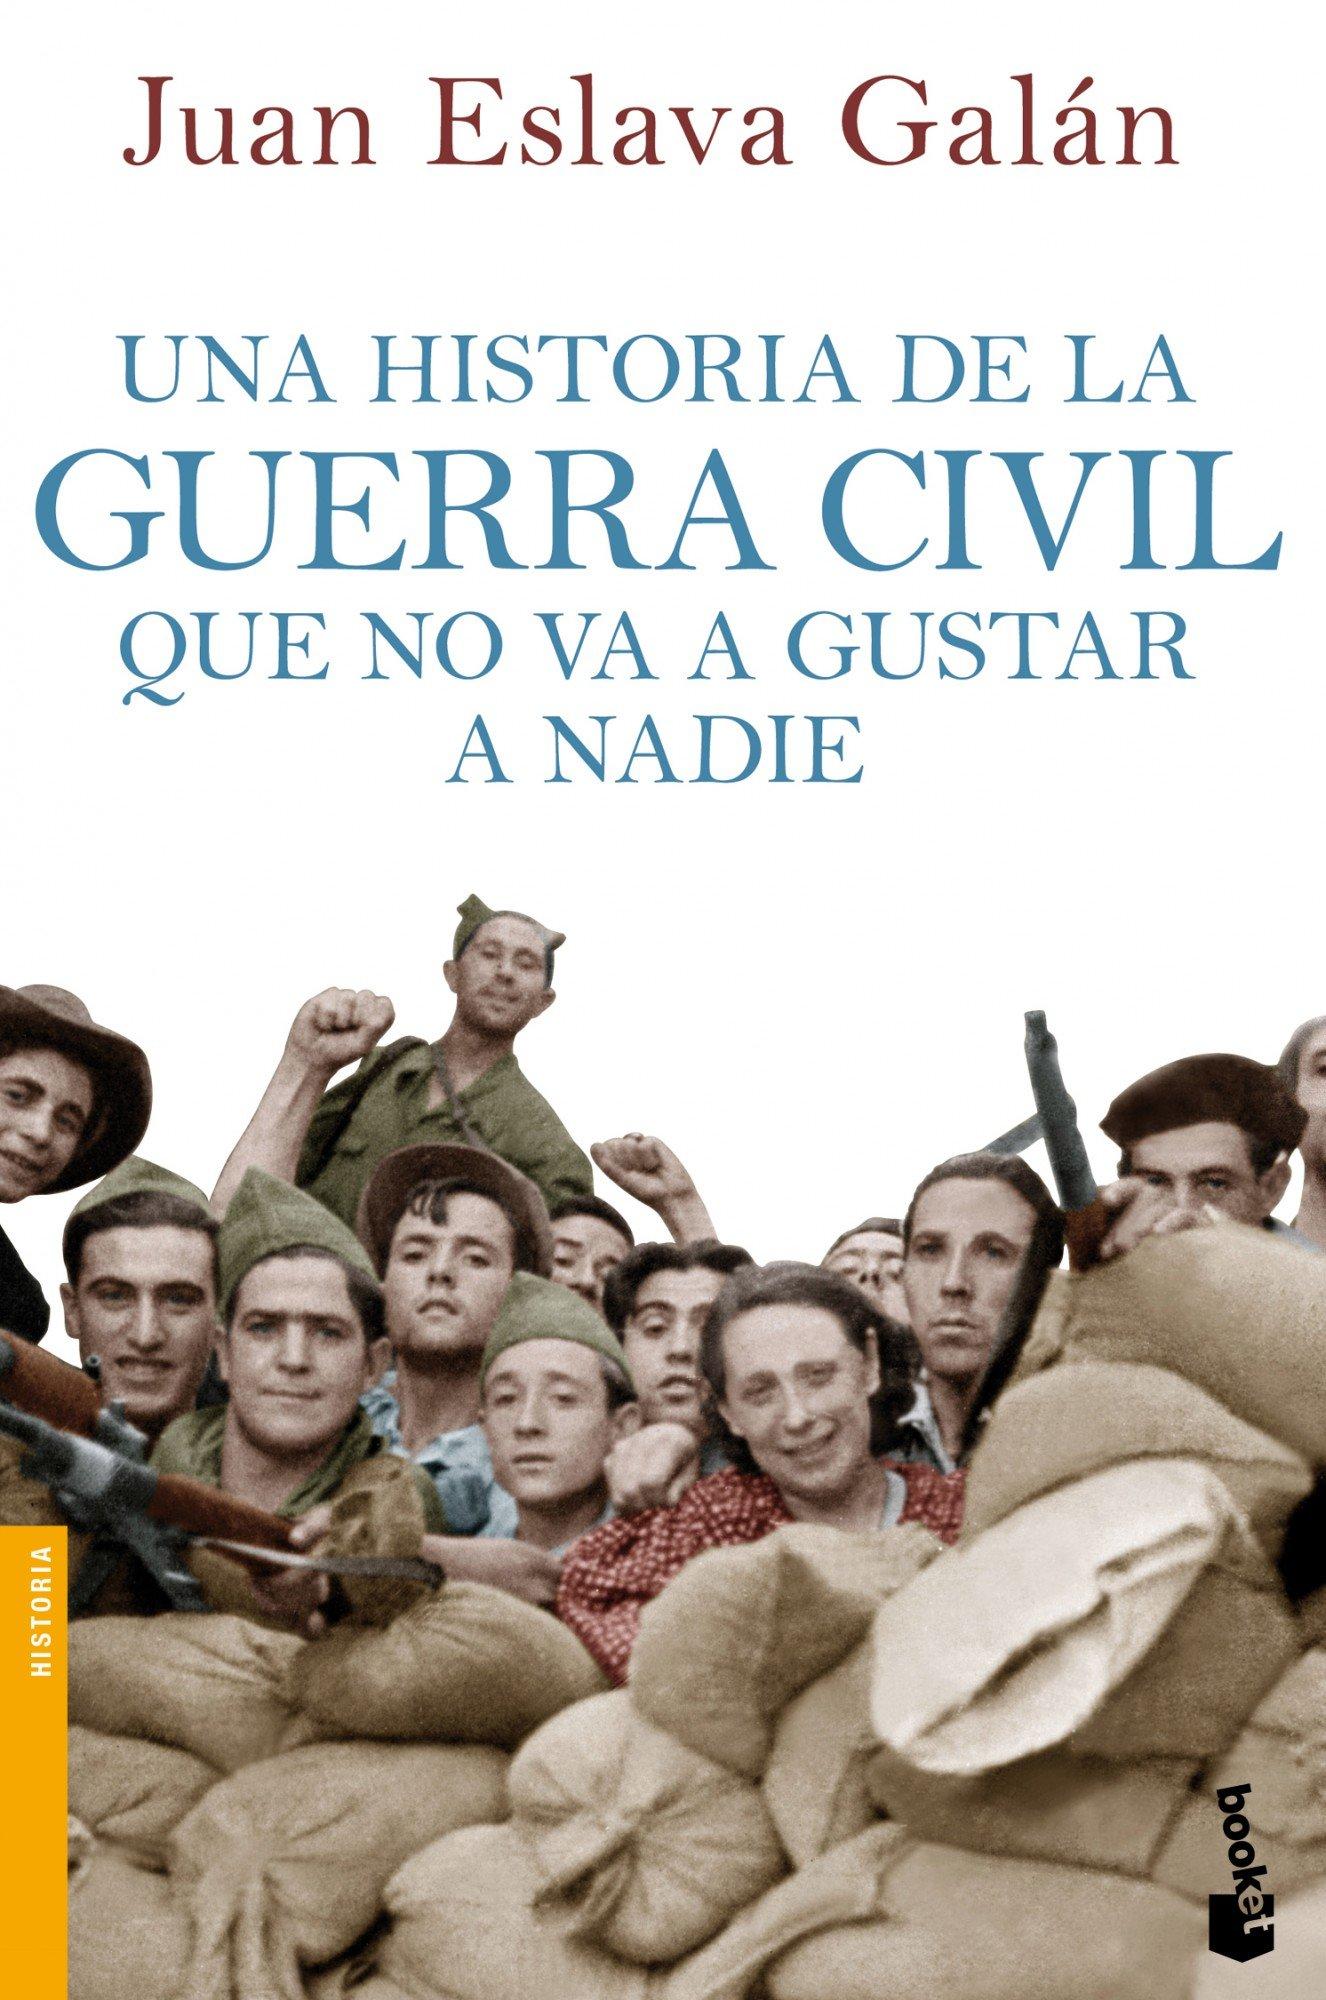 guerra-civi-española-juan-eslava-galan